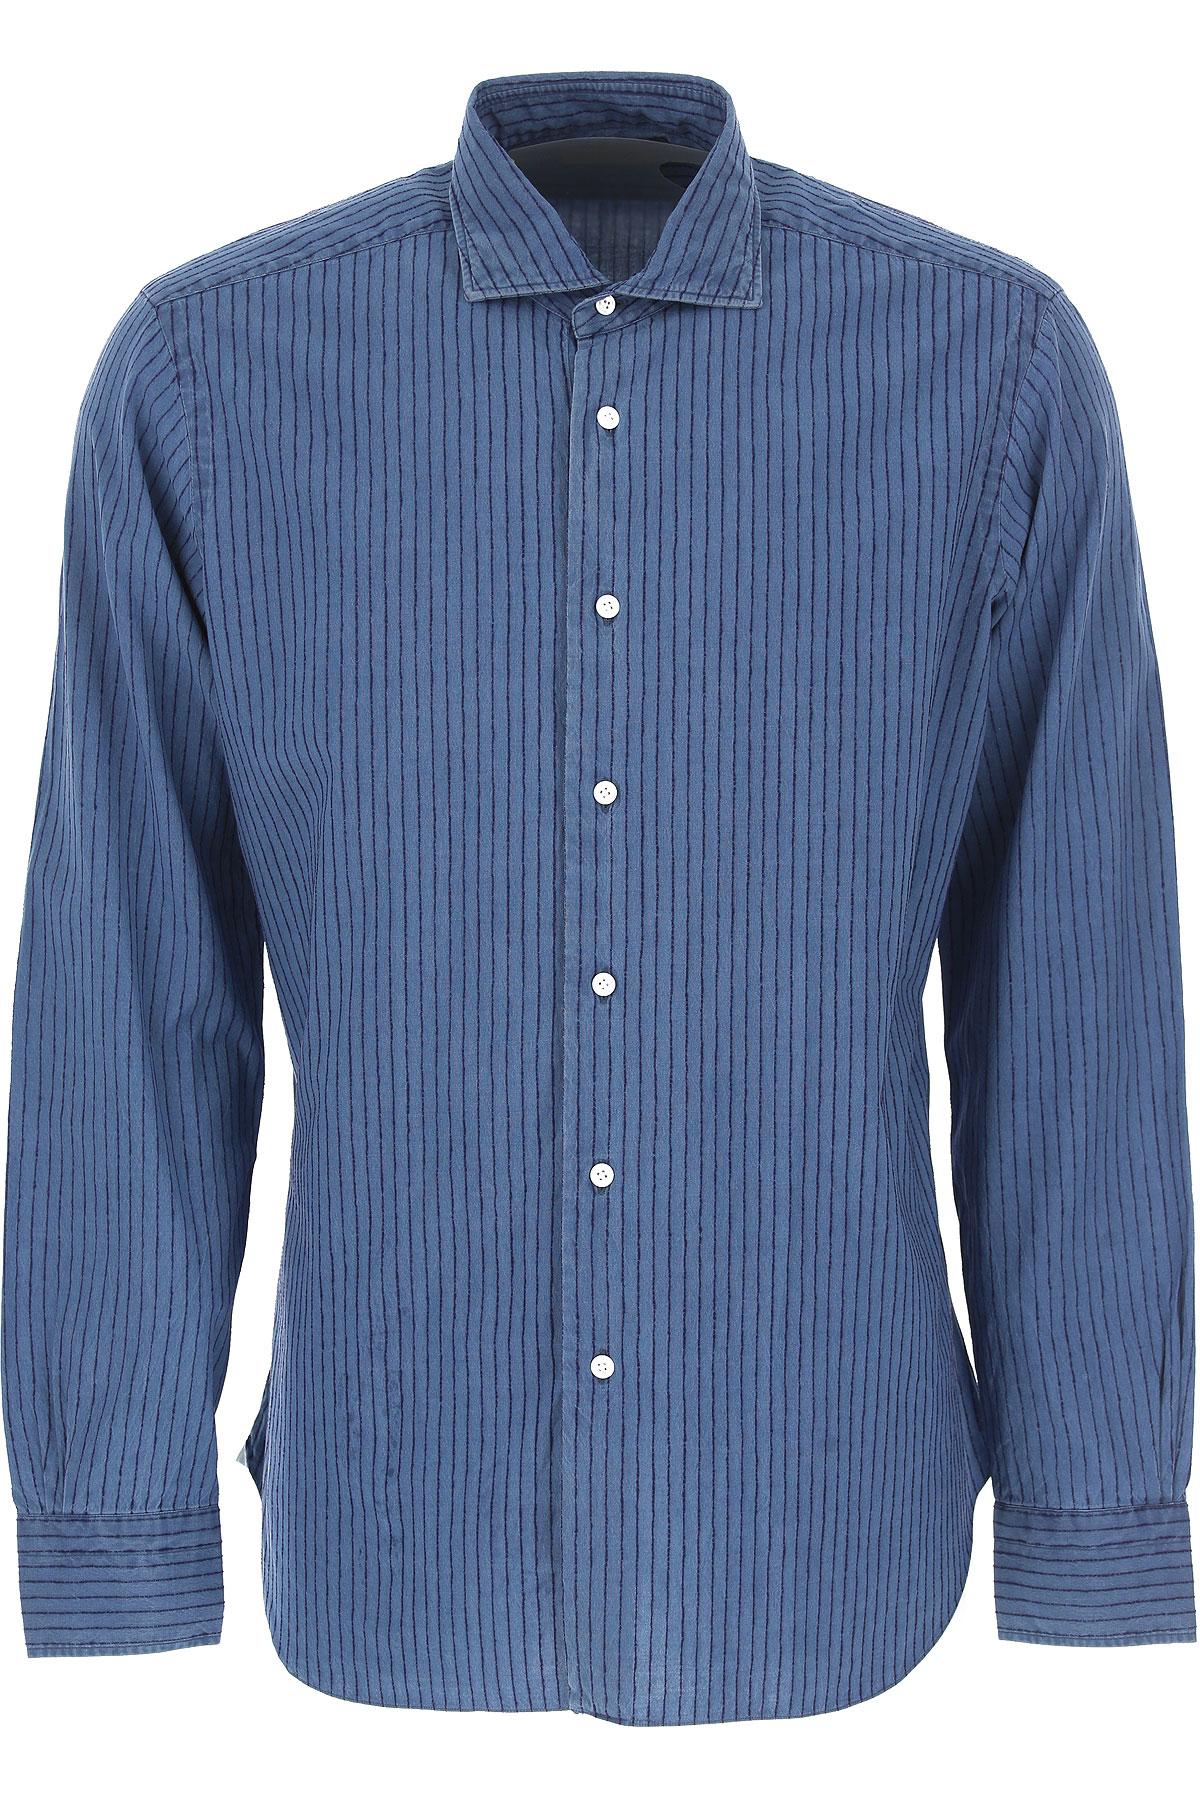 Barba Shirt for Men On Sale in Outlet, Dandy Life, Blue Denim, Cotton, 2019, 17 17.5